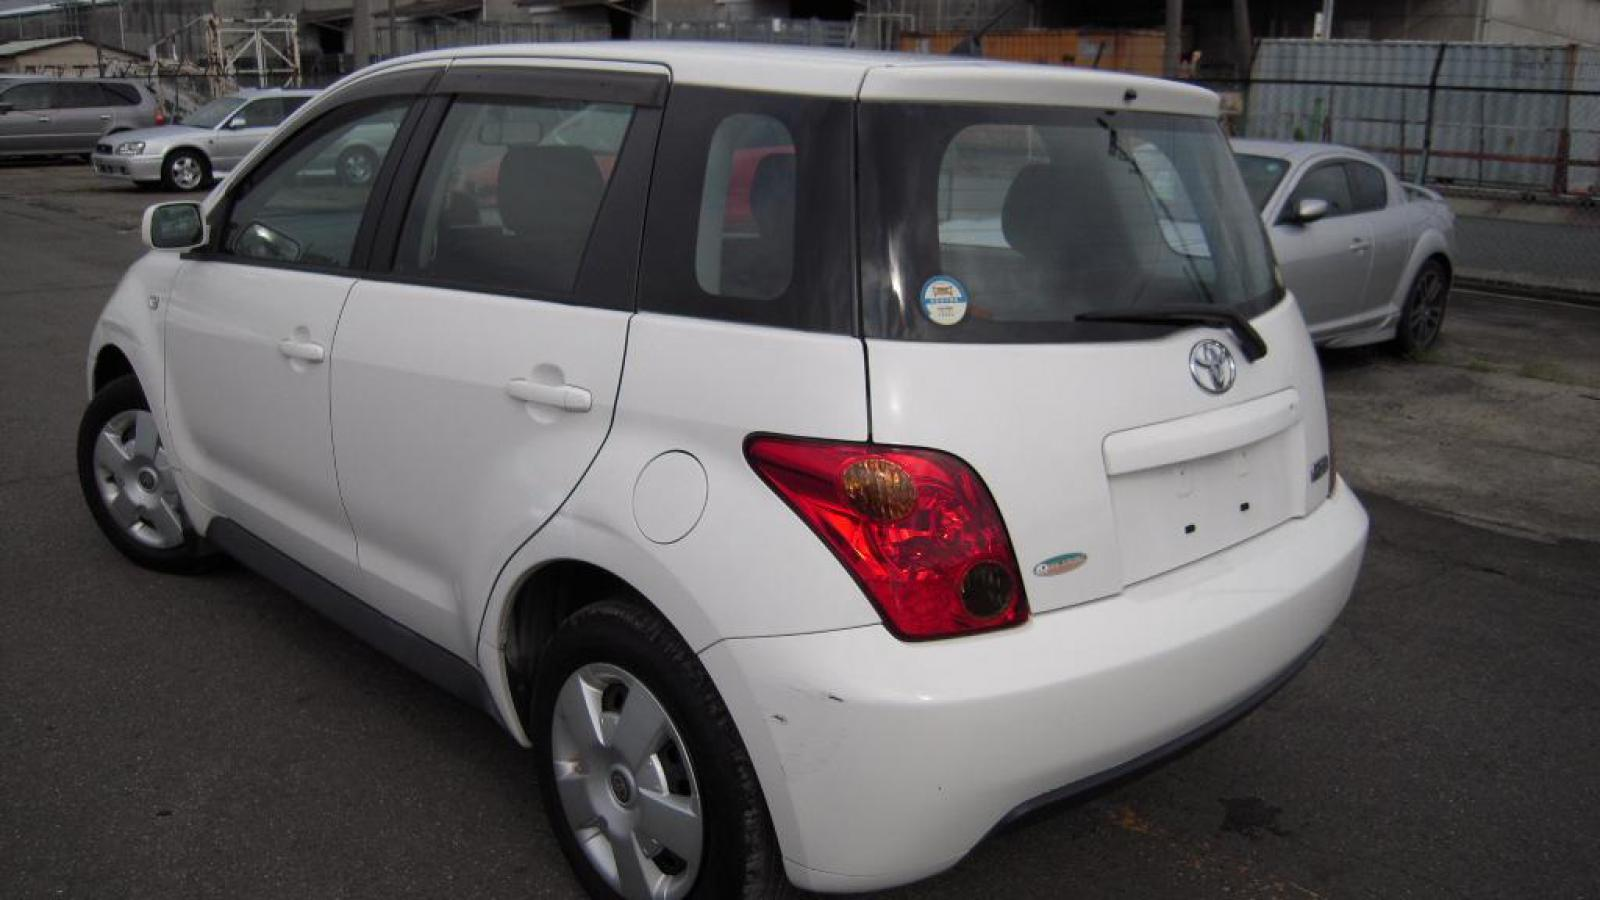 Kelebihan Kekurangan Toyota Ist 2005 Tangguh